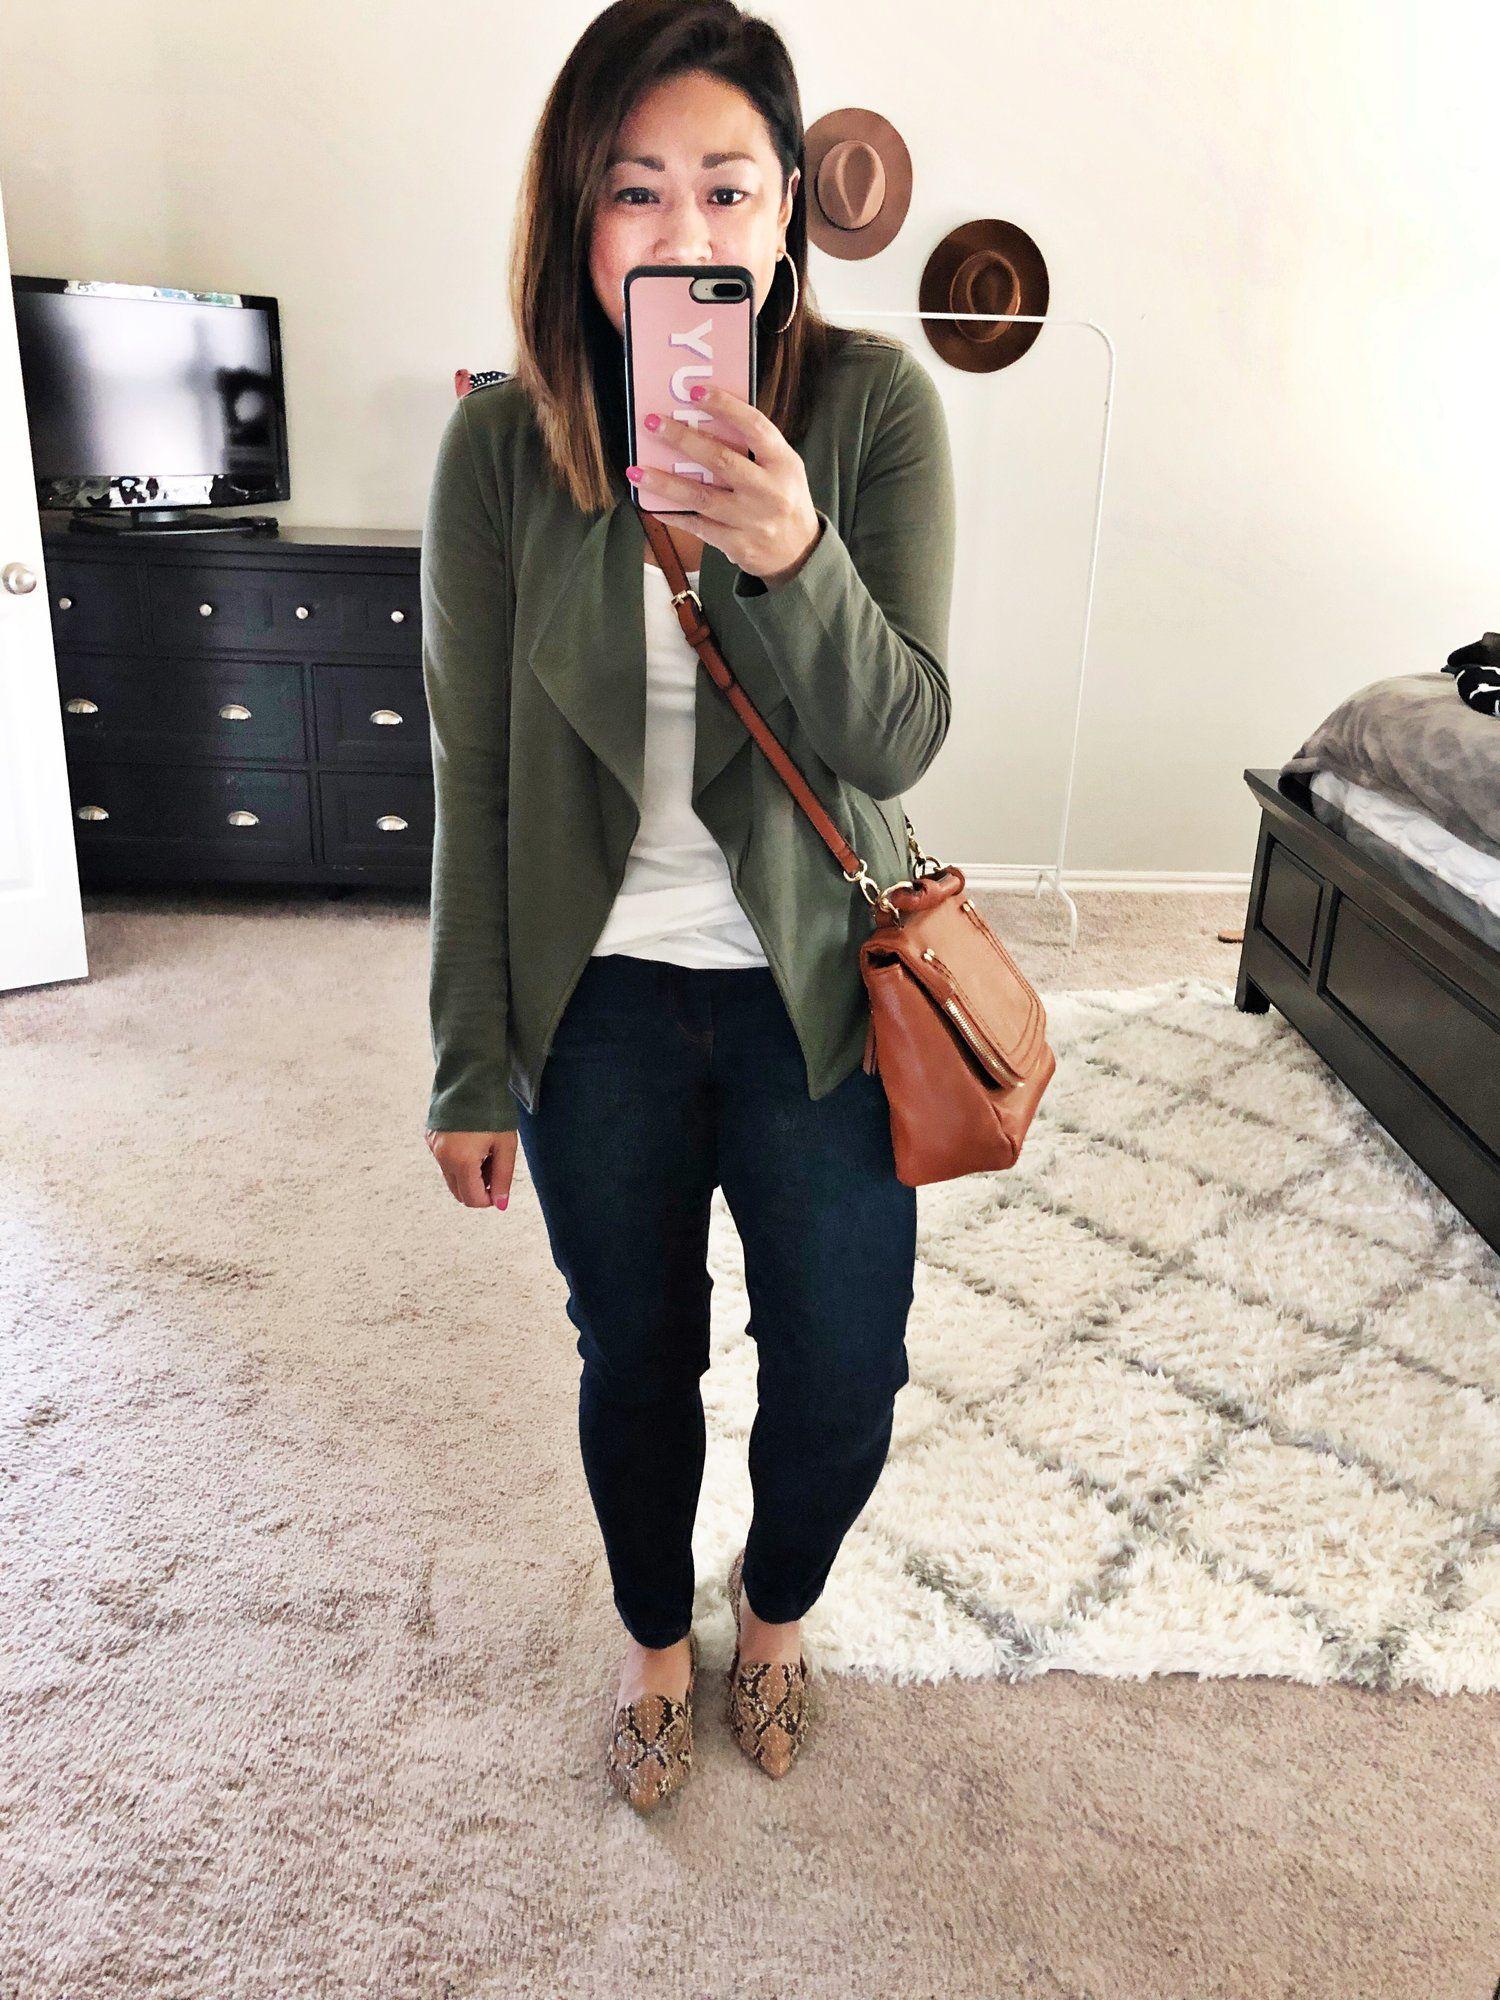 Nsale 2019 Try On Sweaters Jeans Wit Wisdom Jeans